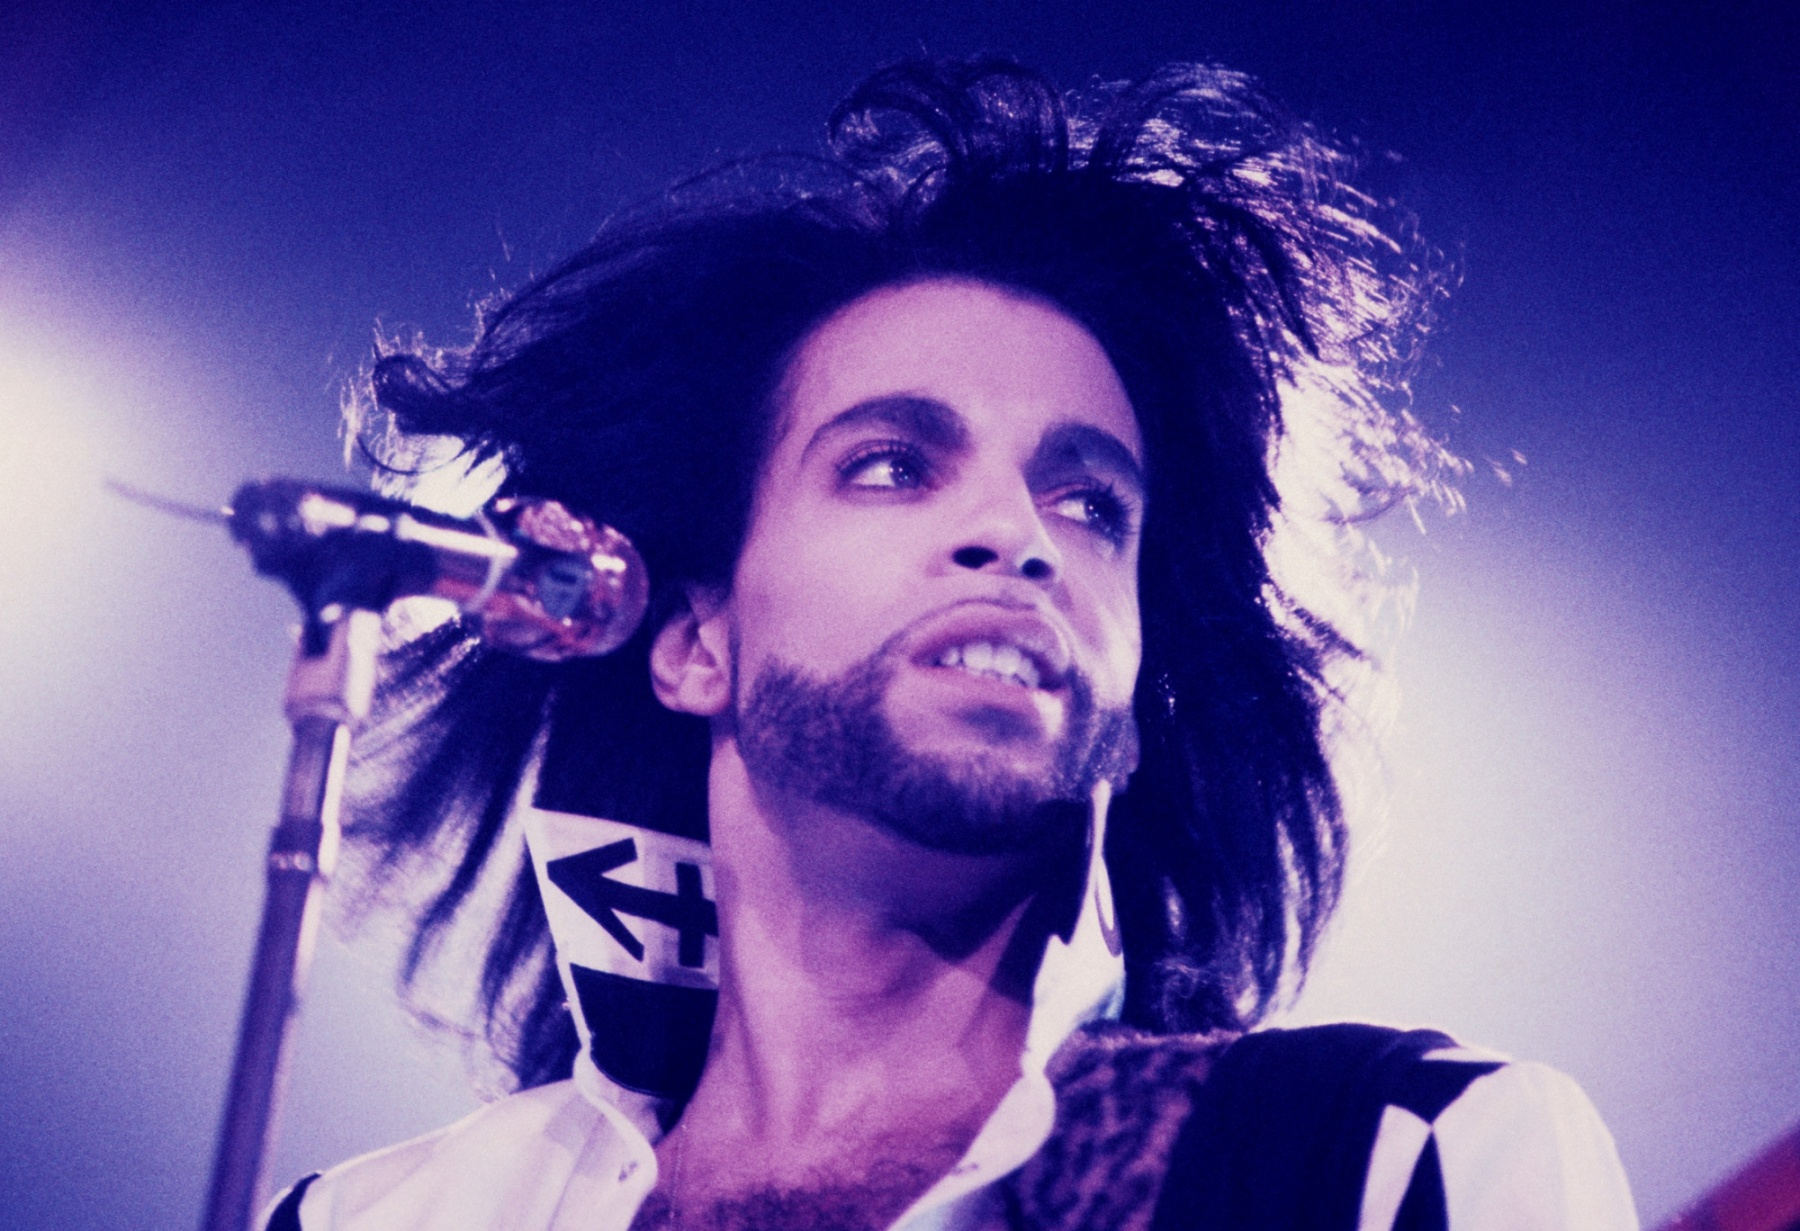 La biographie de Prince sortira cet automne | ICI